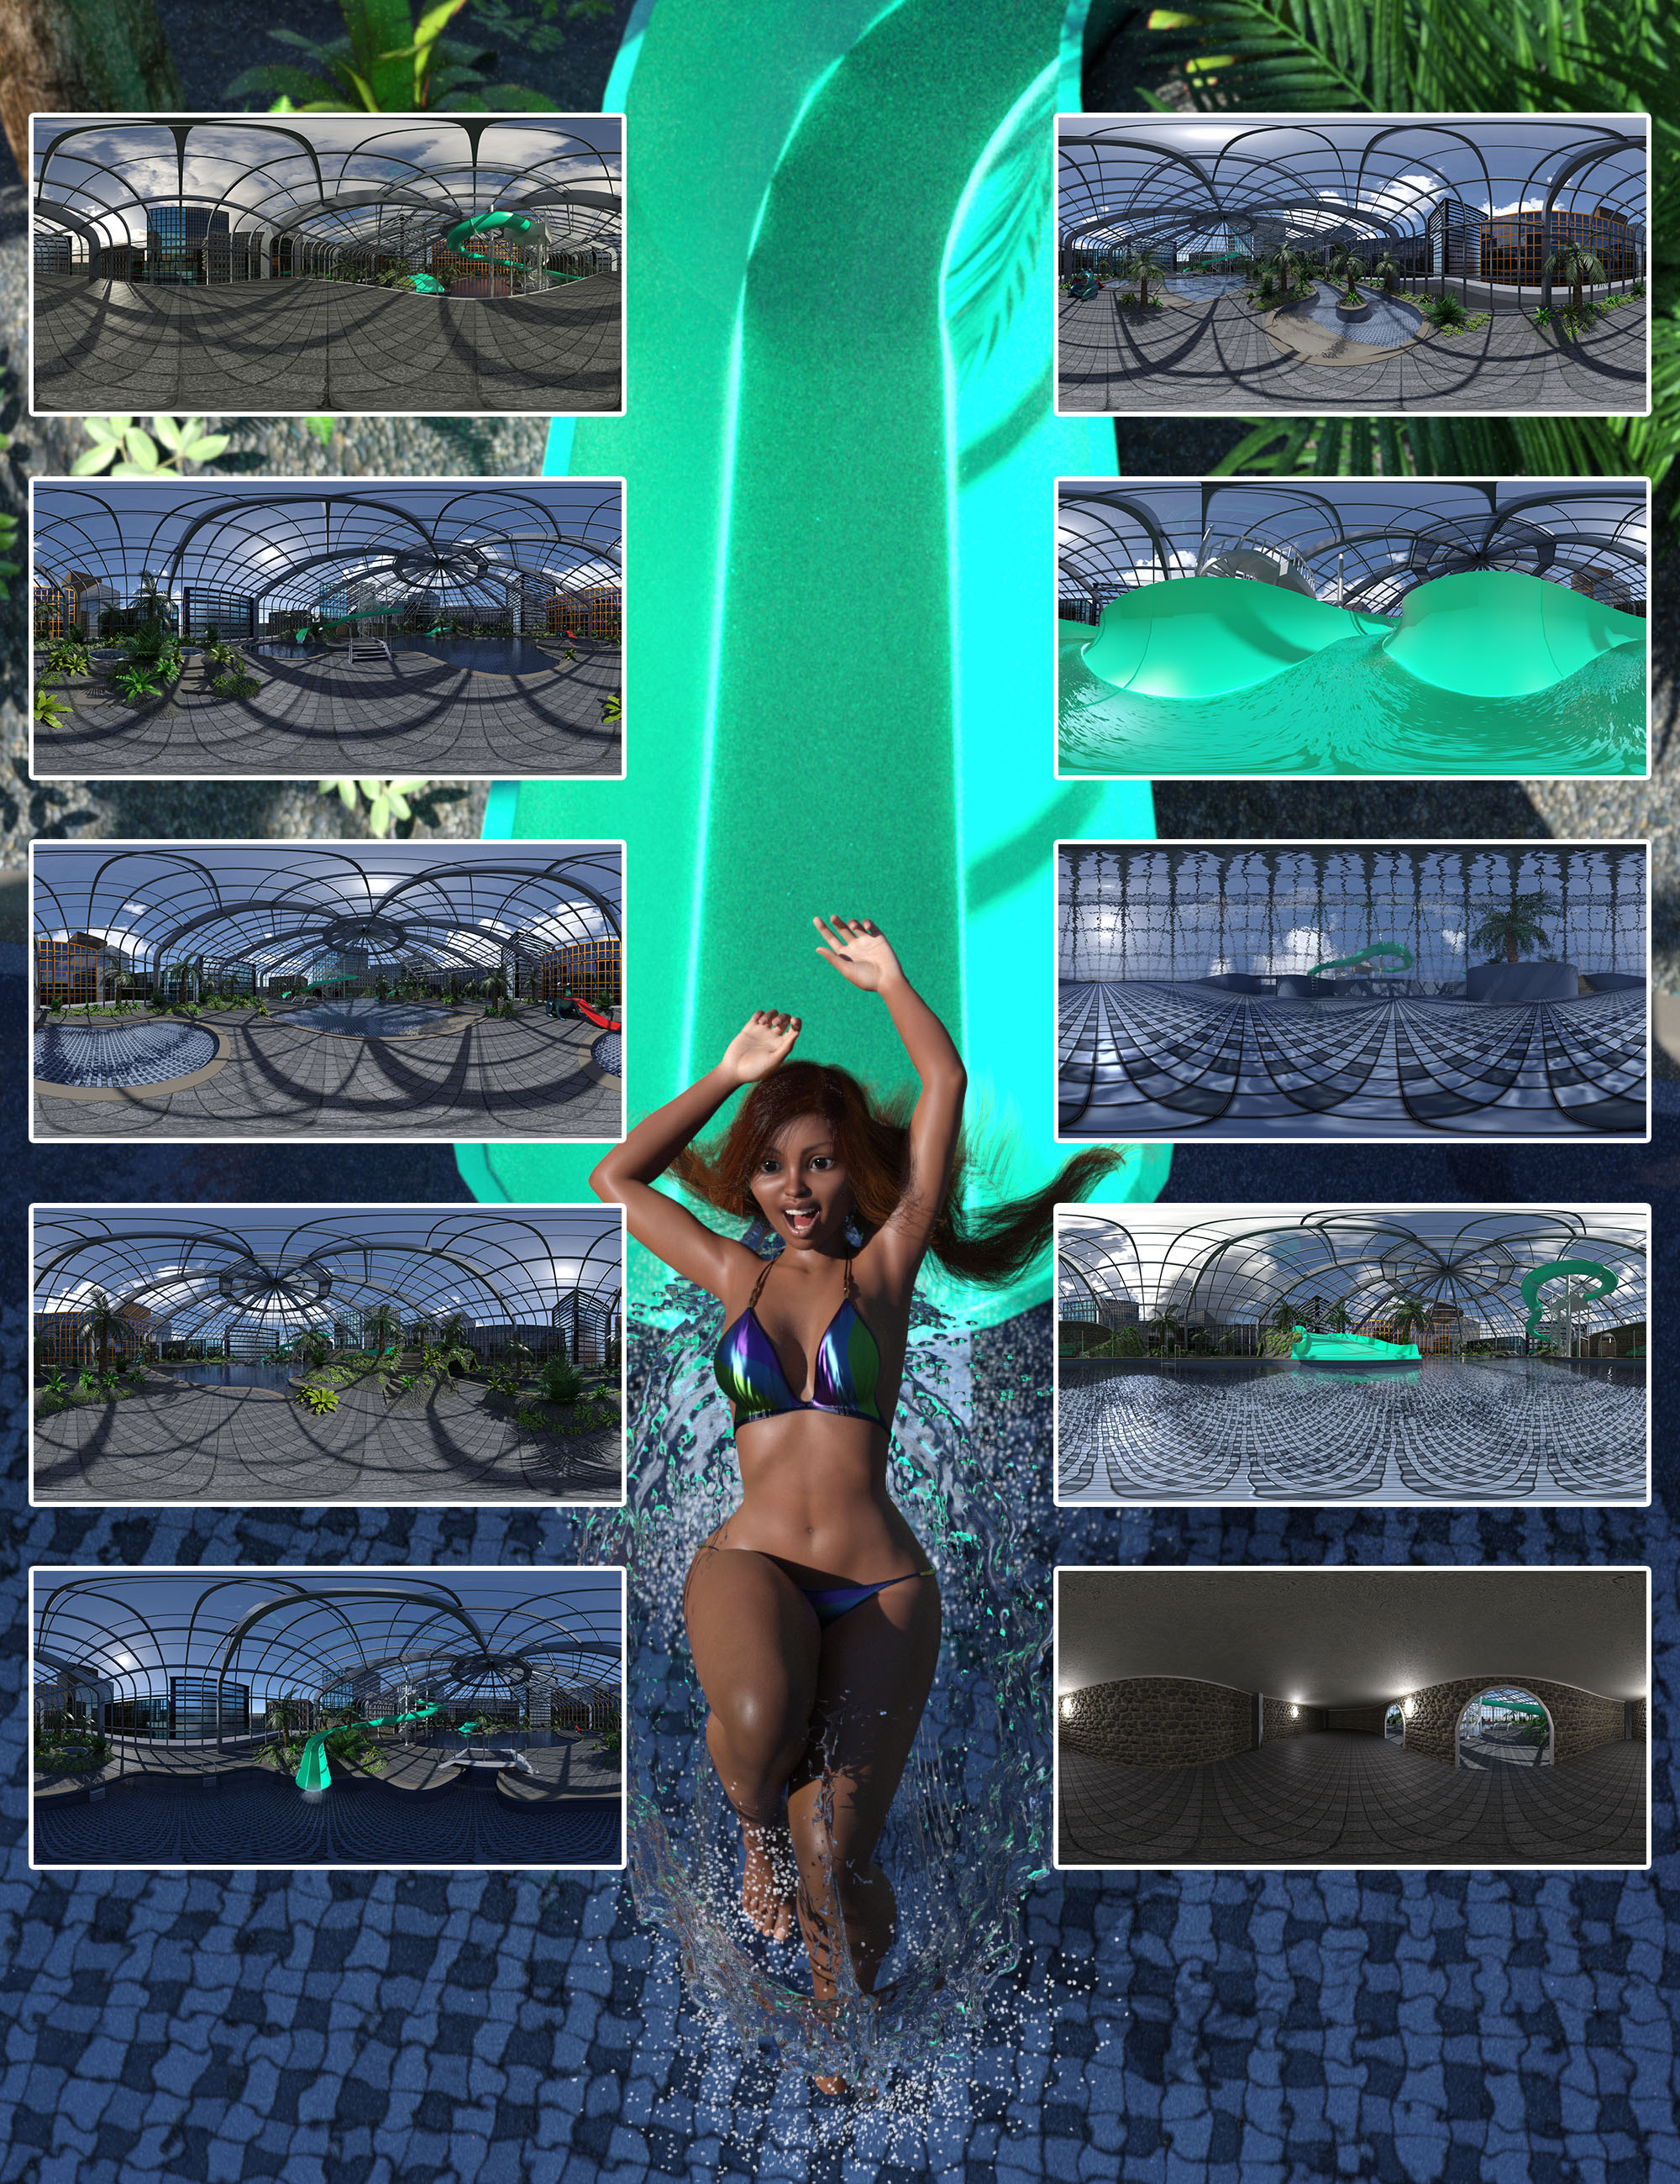 Fantasy IBL - Penthouse Water Park HDRI by: Denki Gaka, 3D Models by Daz 3D